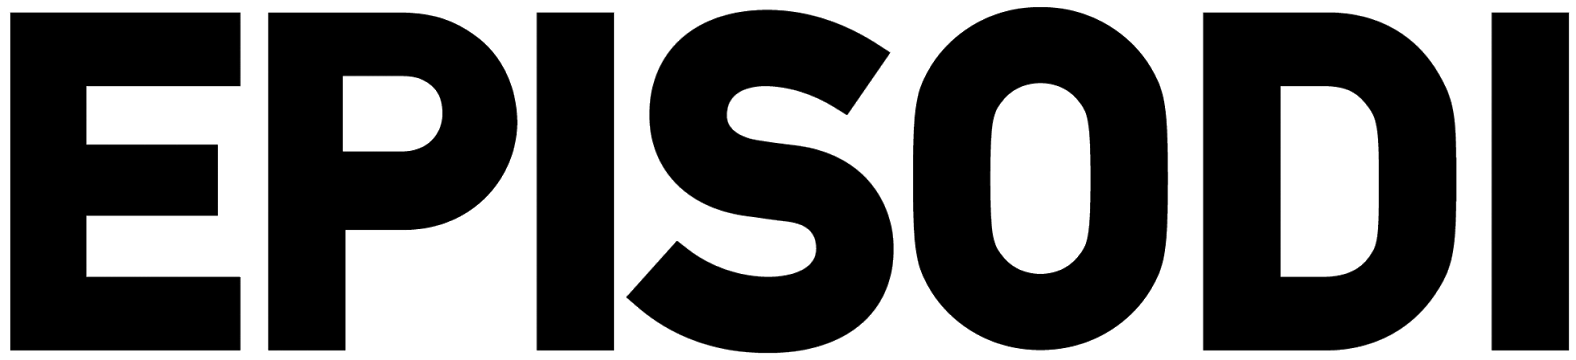 Episodi_logo2